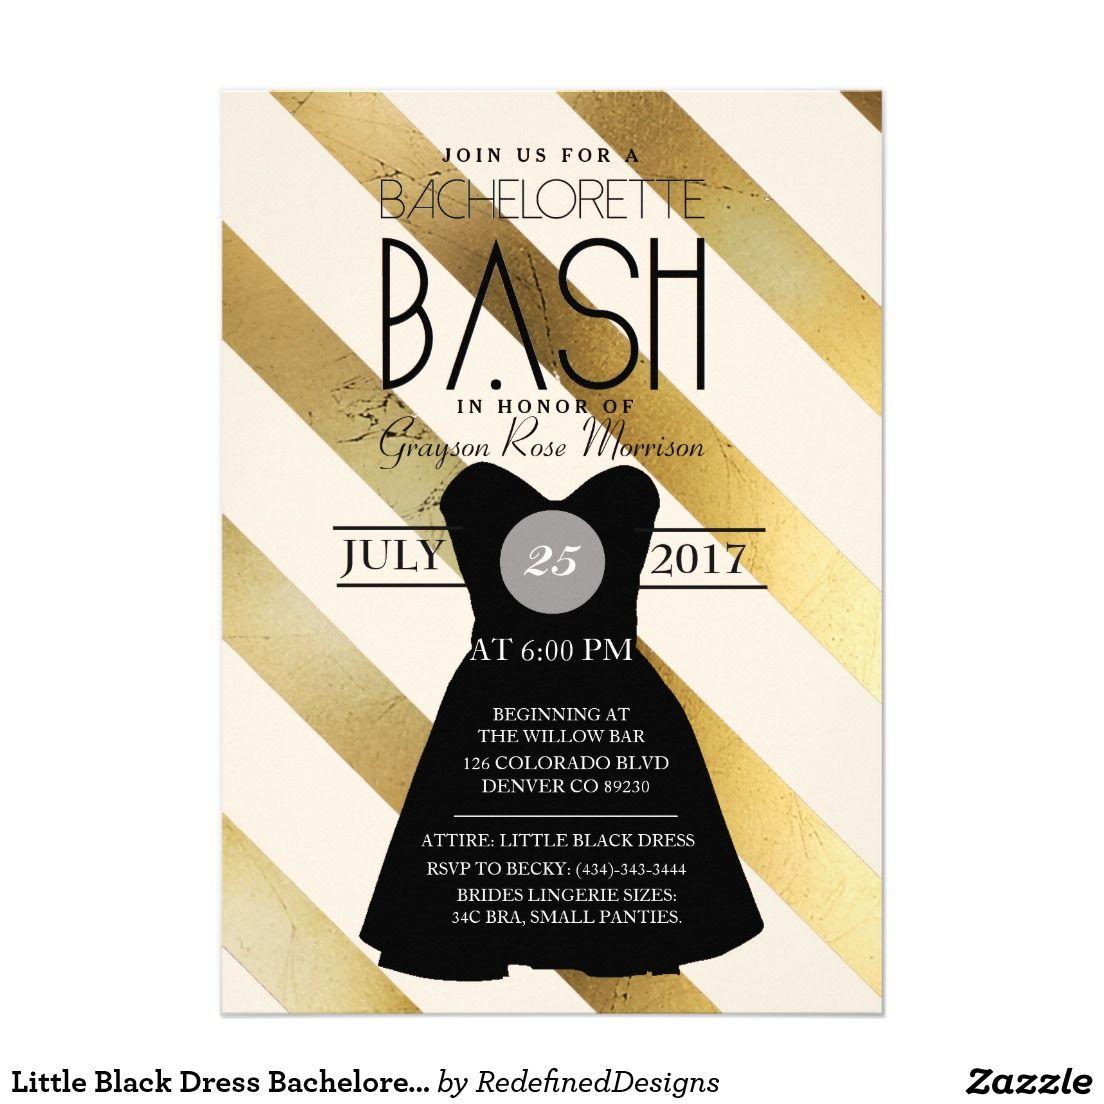 Little Black Dress Bachelorette Bash | Party Card | Bachelorette ...